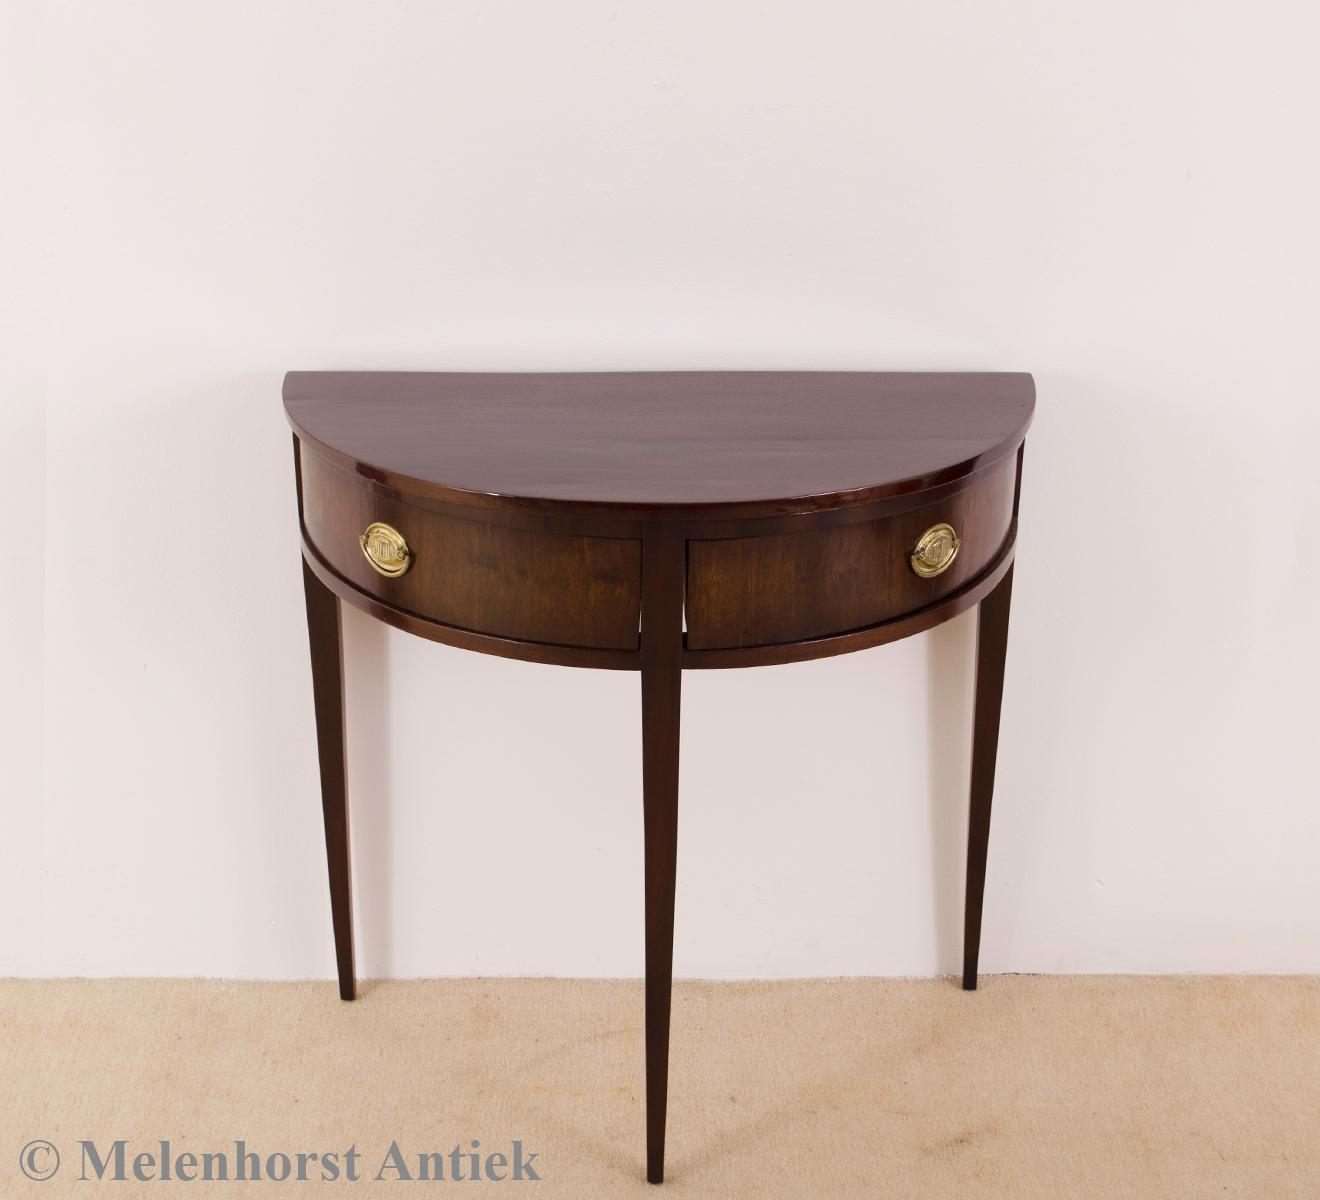 halbmond tisch antike uhren melenhorst. Black Bedroom Furniture Sets. Home Design Ideas